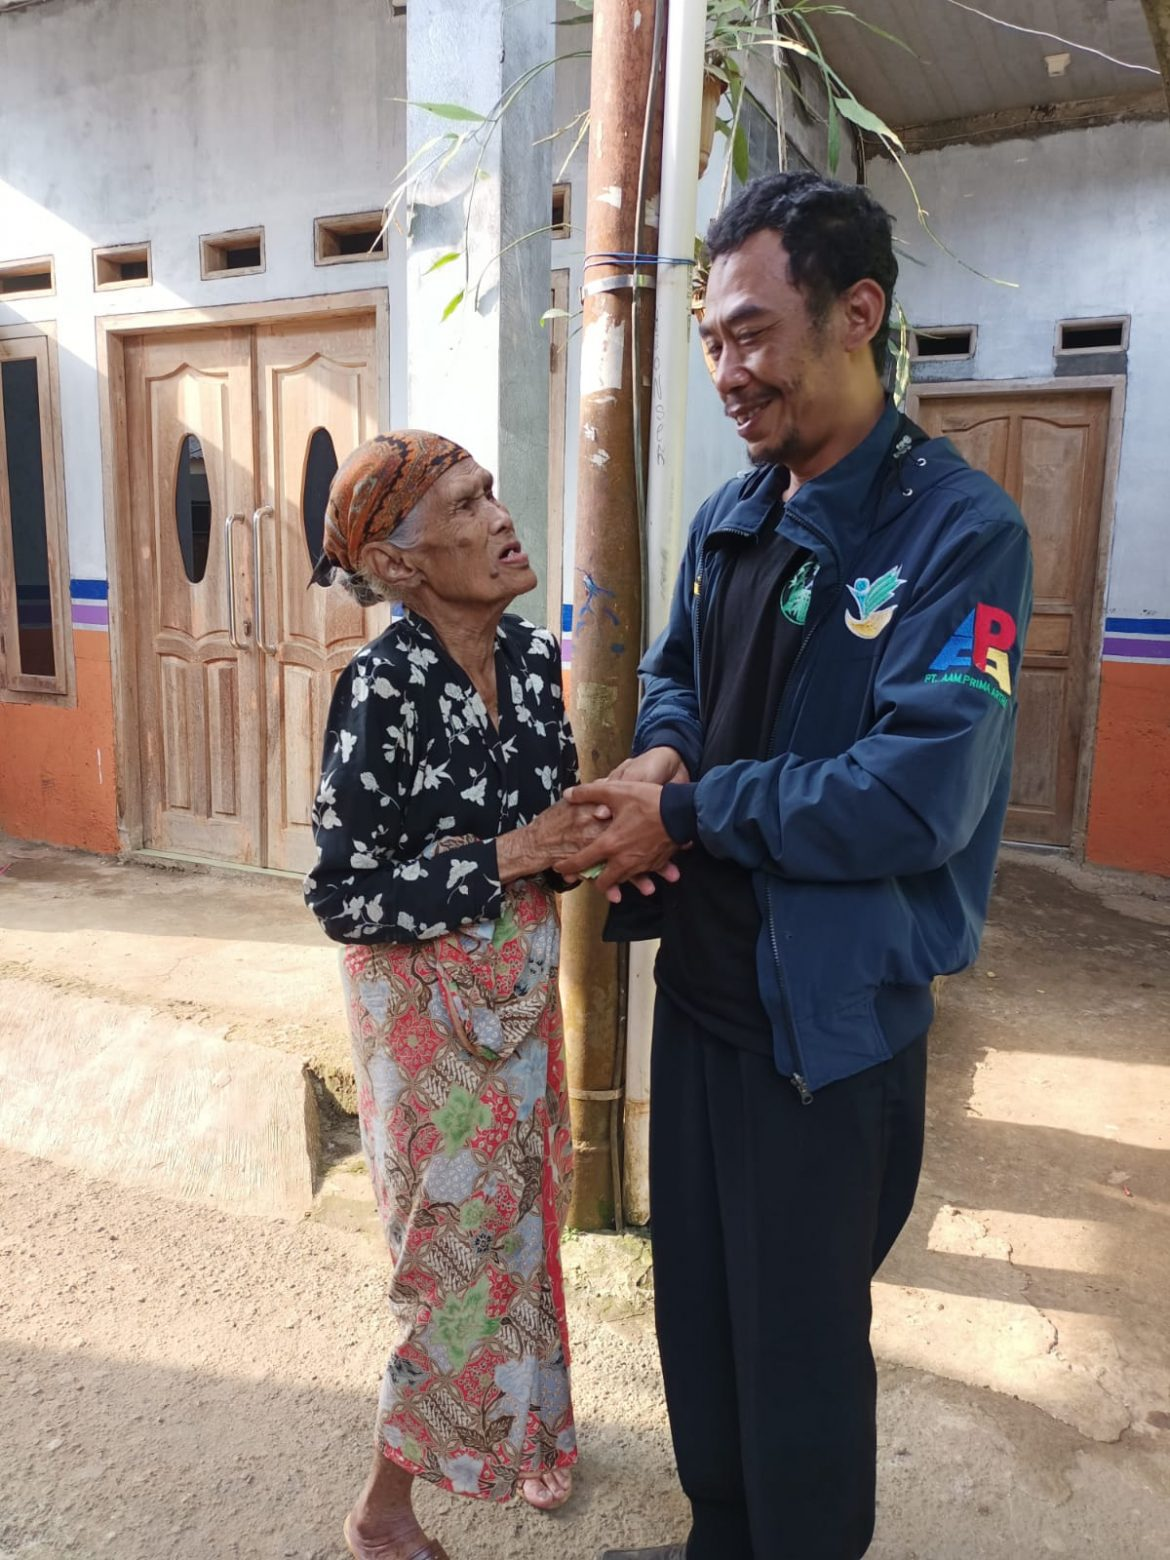 Aksi Sosial, Paguyuban Agen Sembako Mandiri Kecamatan Caringin Santuni Anak Yatim dan Jompo di Tiga Desa